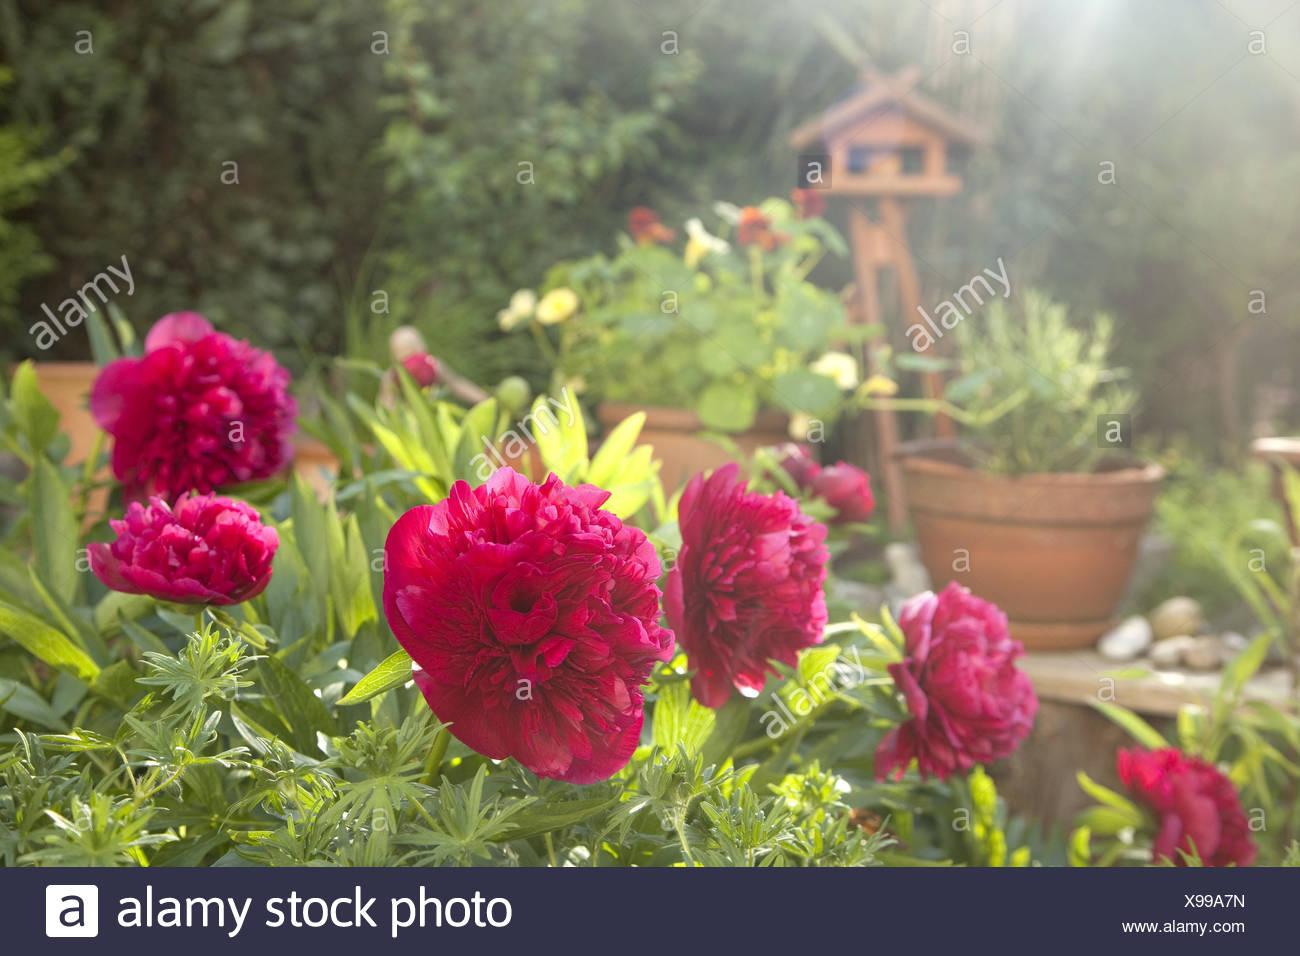 Pfingstrosen, Blüte, Garten, im Freien Schuss, Garten, Blumen, Paeonia, Pflanze, Blume, rosa, Stockbild